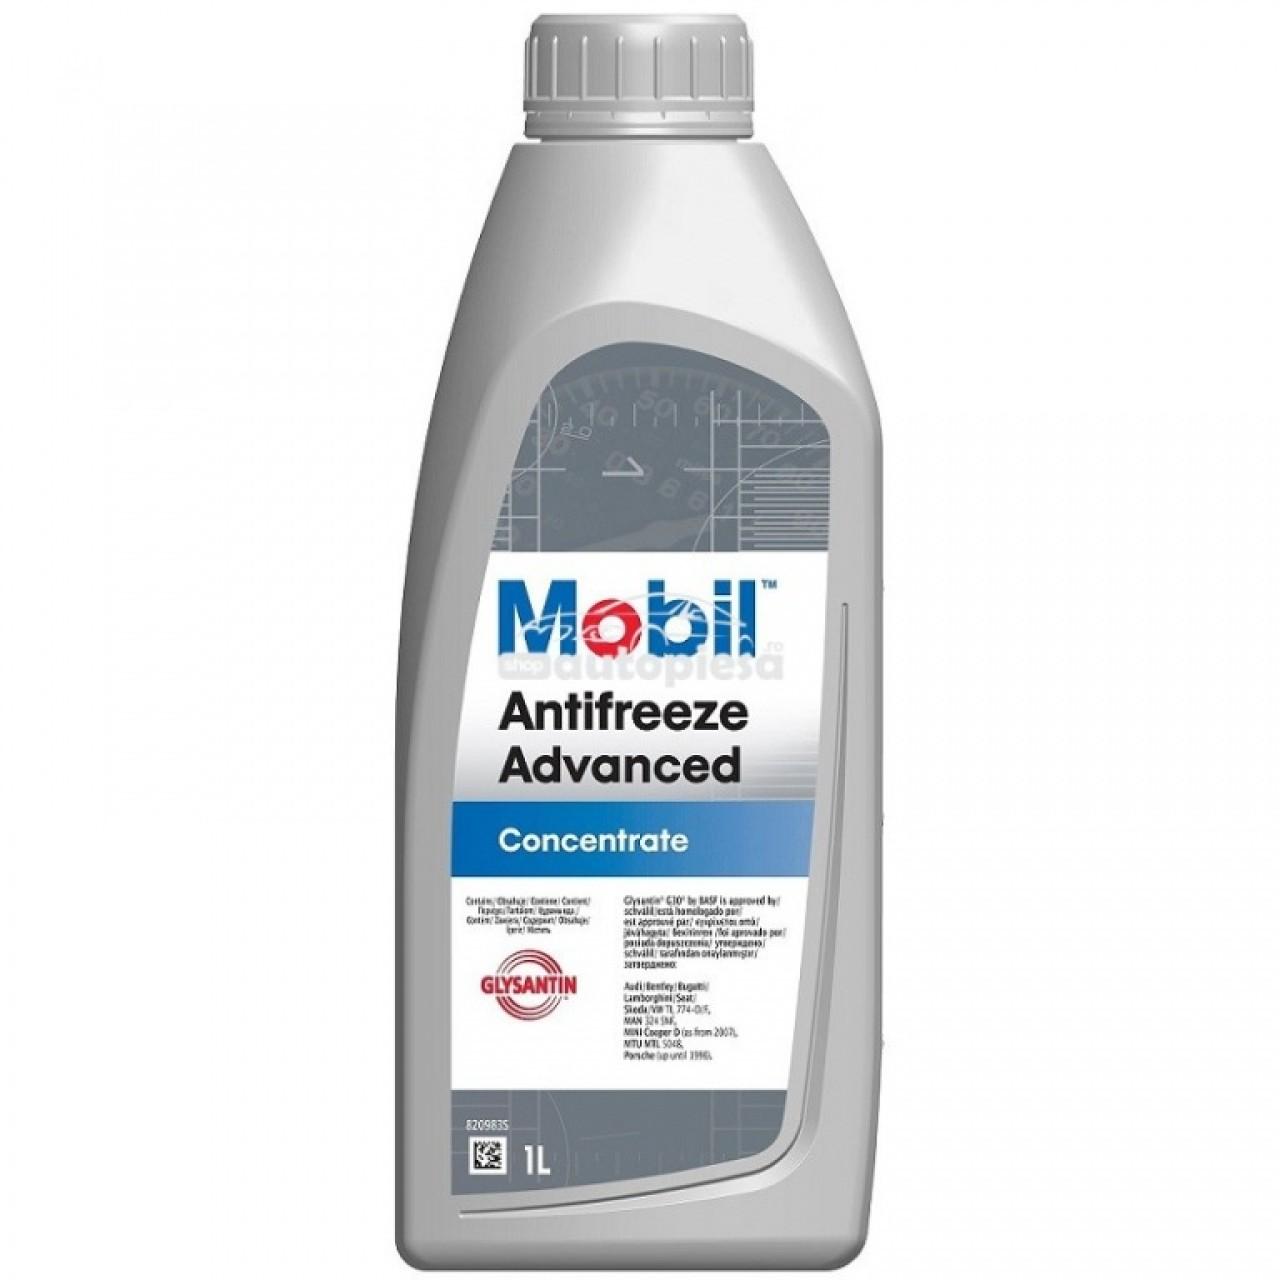 Antigel concentrat MOBIL Antifreeze Advanced G12 / G12+ Rosu / Roz 1 L MOB ANTI ADV 1L piesa NOUA